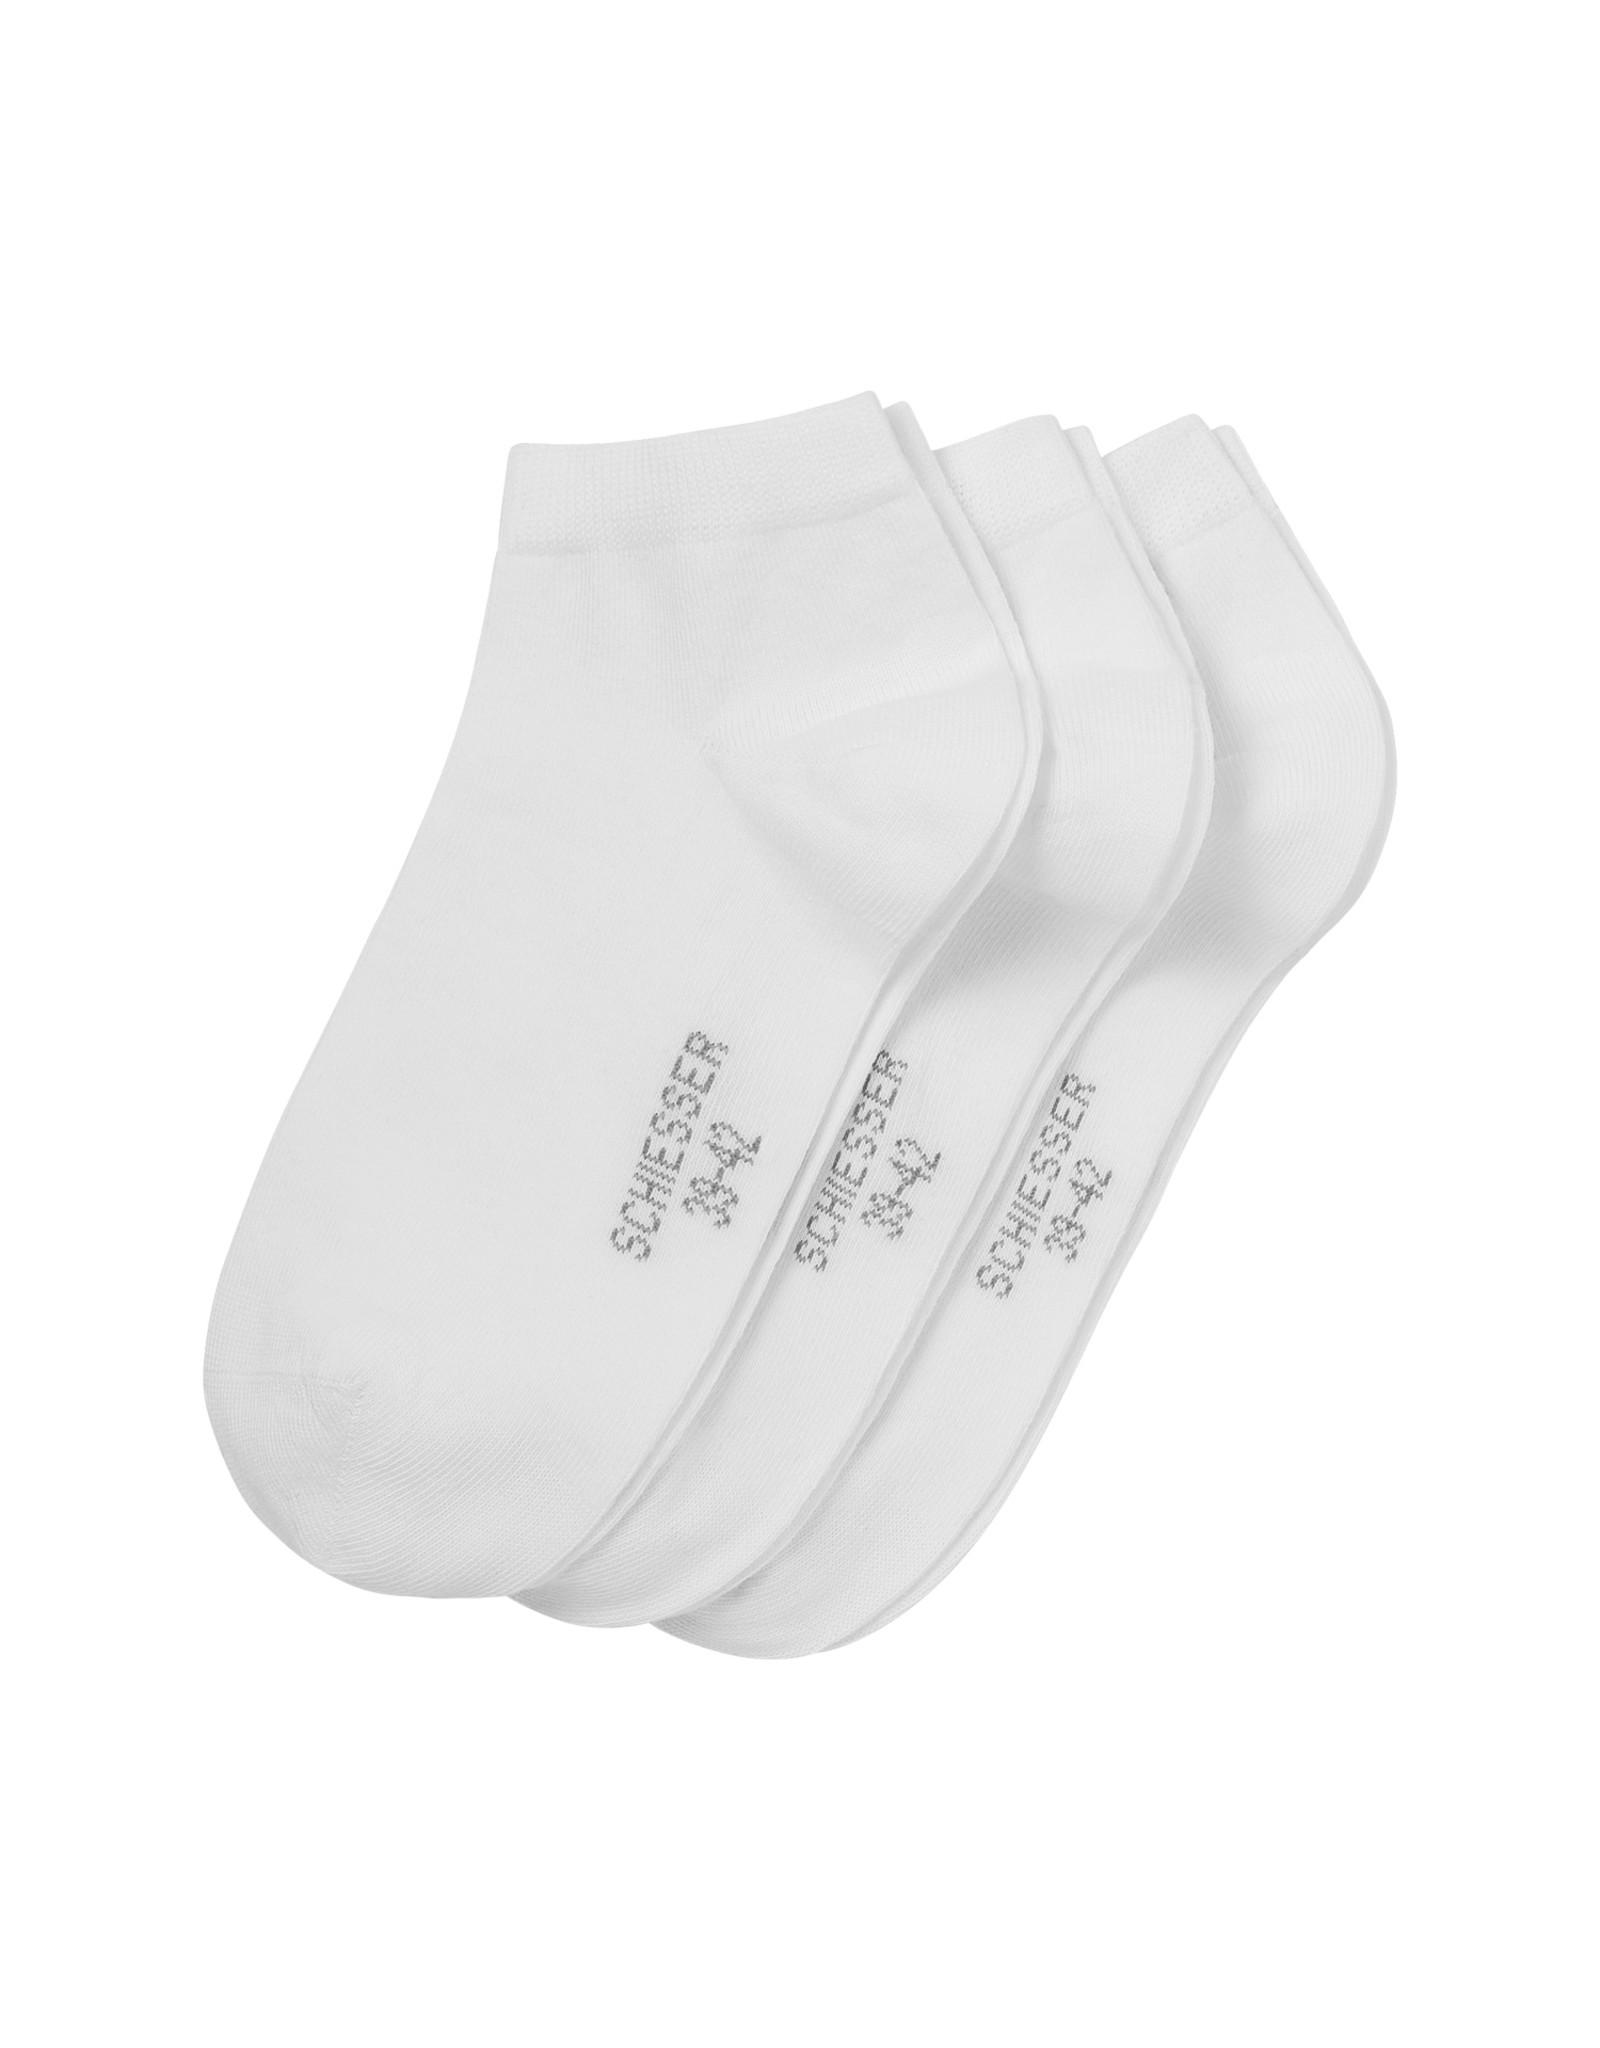 Schiesser Cotton sneaker socks, white